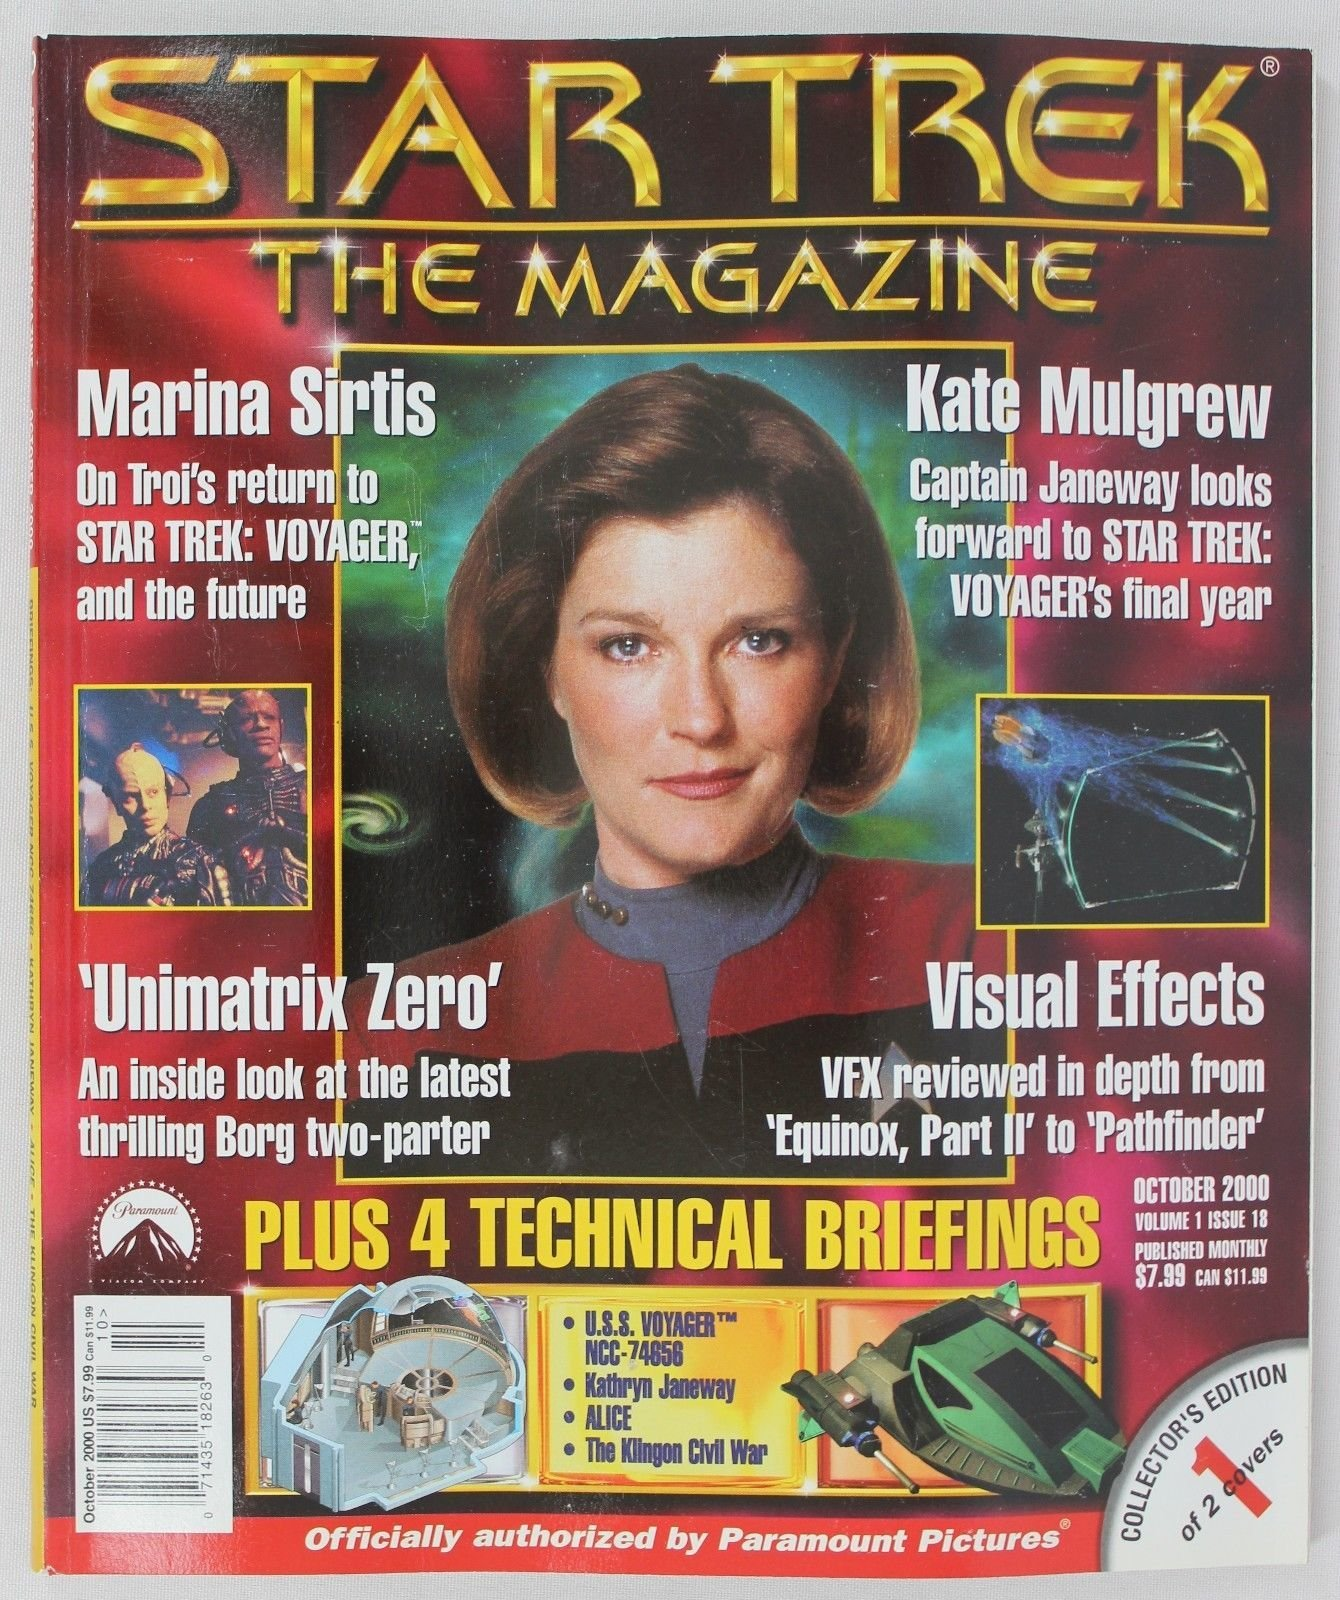 Download Star Trek  The Magazine  Issue 18  October 2000 ebook